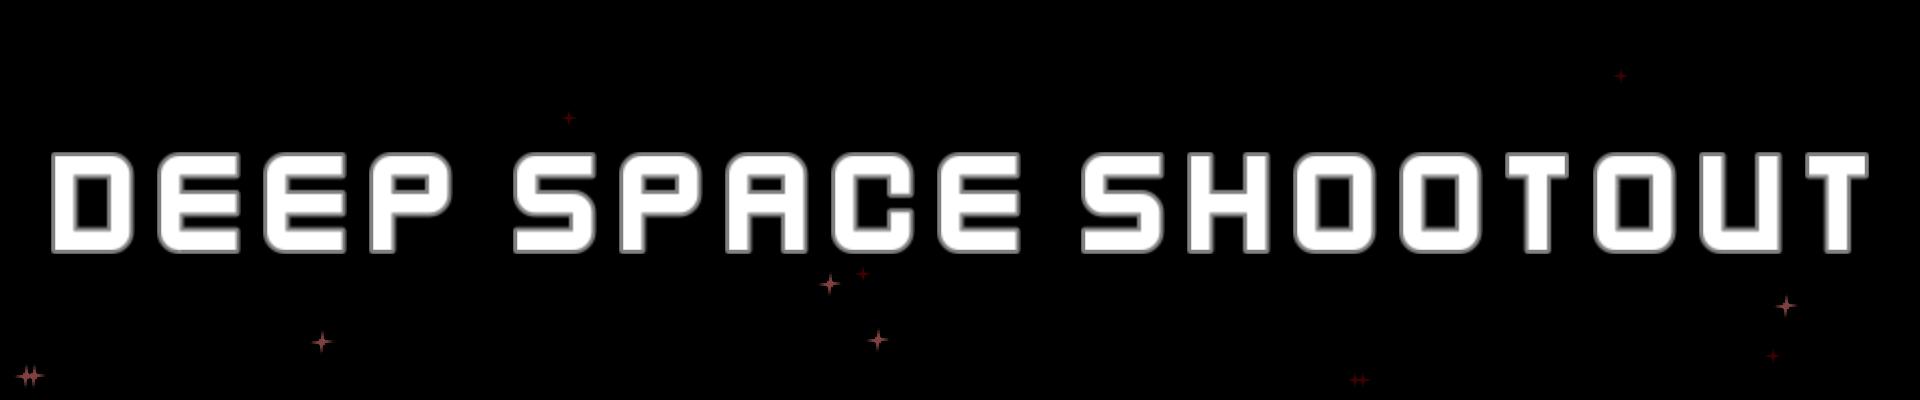 DeepSpace Shootout